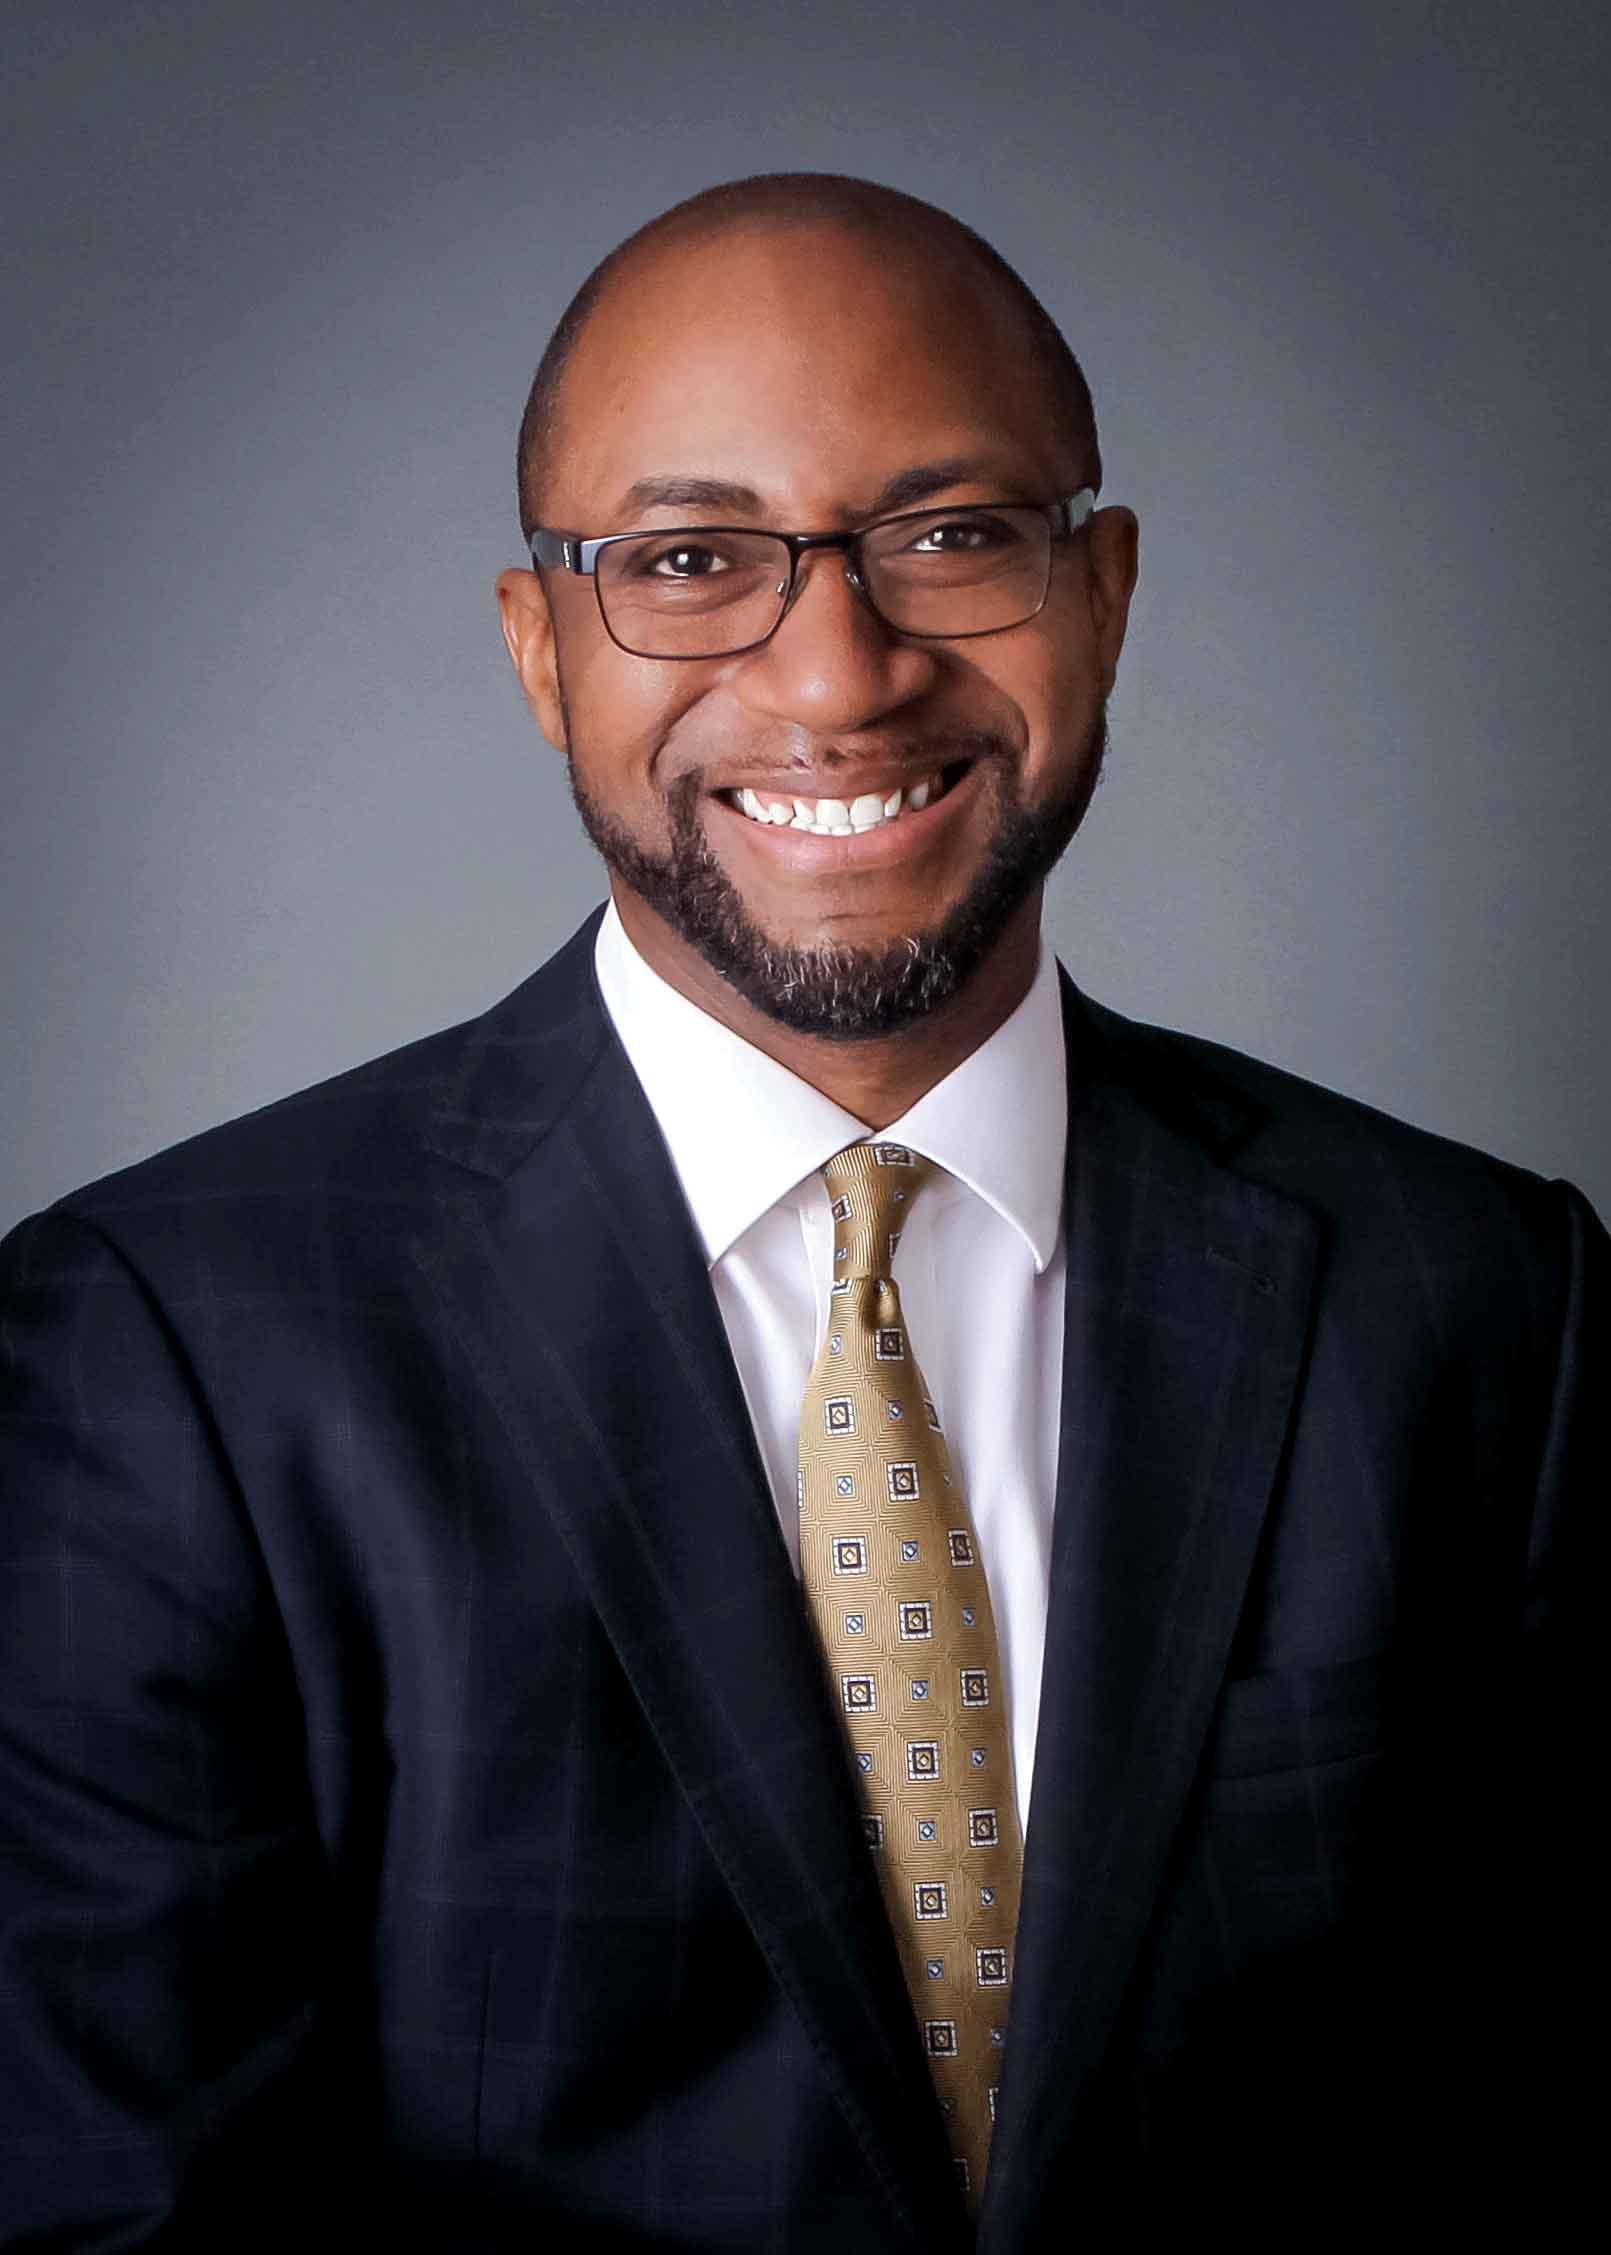 Stephen Brooks Joins Southwestern Union as New Executive Secretary